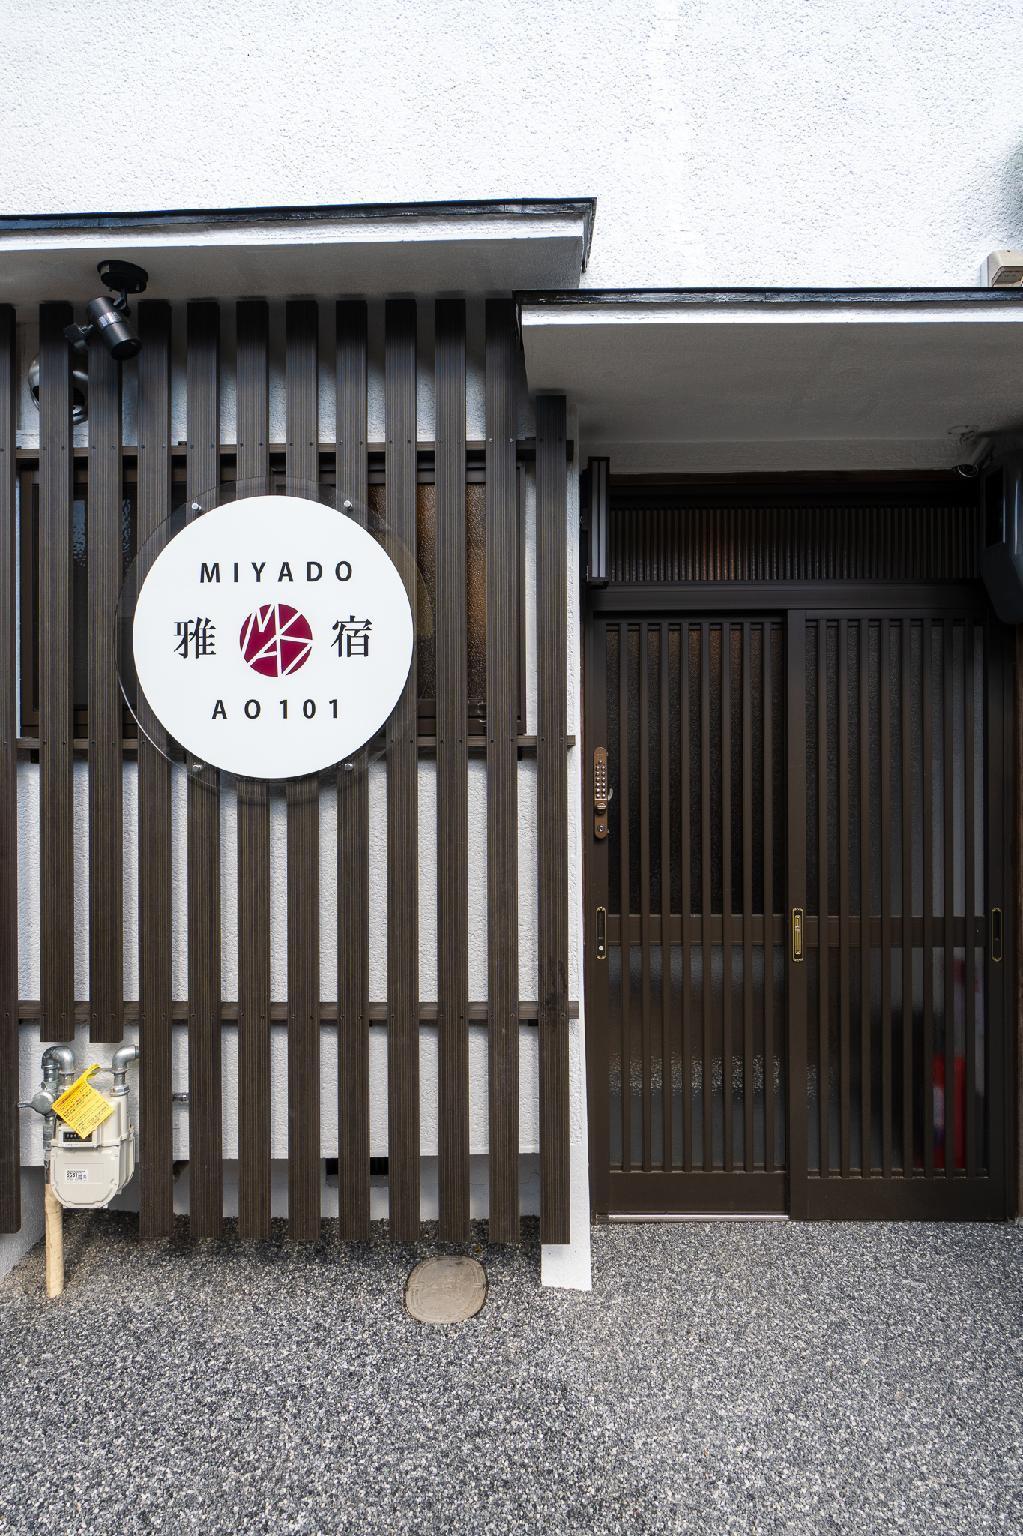 D214. Easy Access Umeda Spacious House Max6  AO101